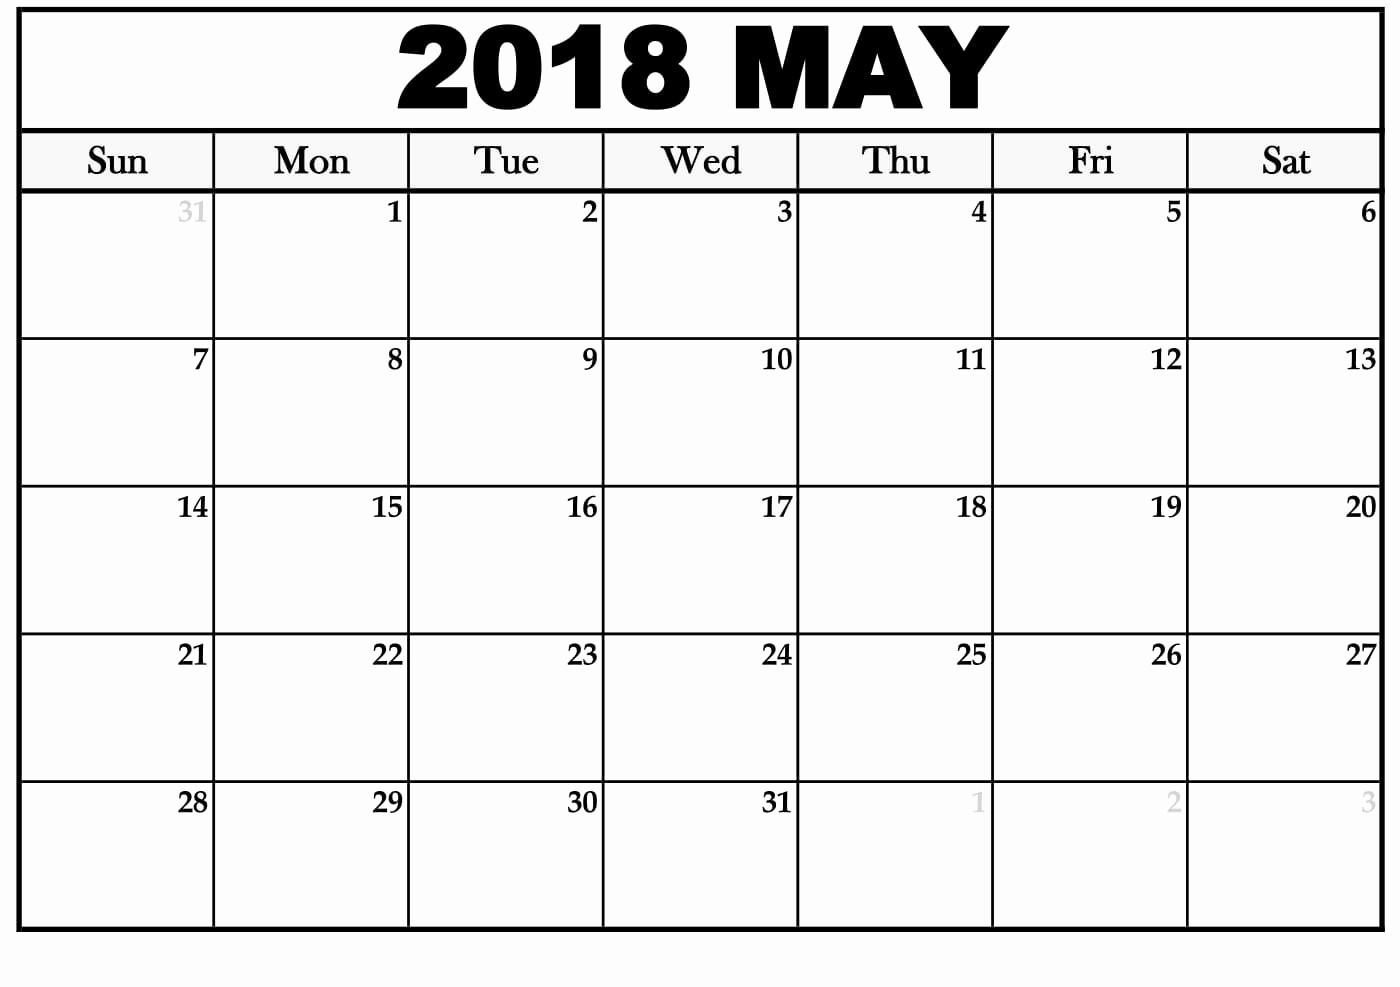 Blank May 2018 Calendar Printable Beautiful May 2018 Blank Calendar